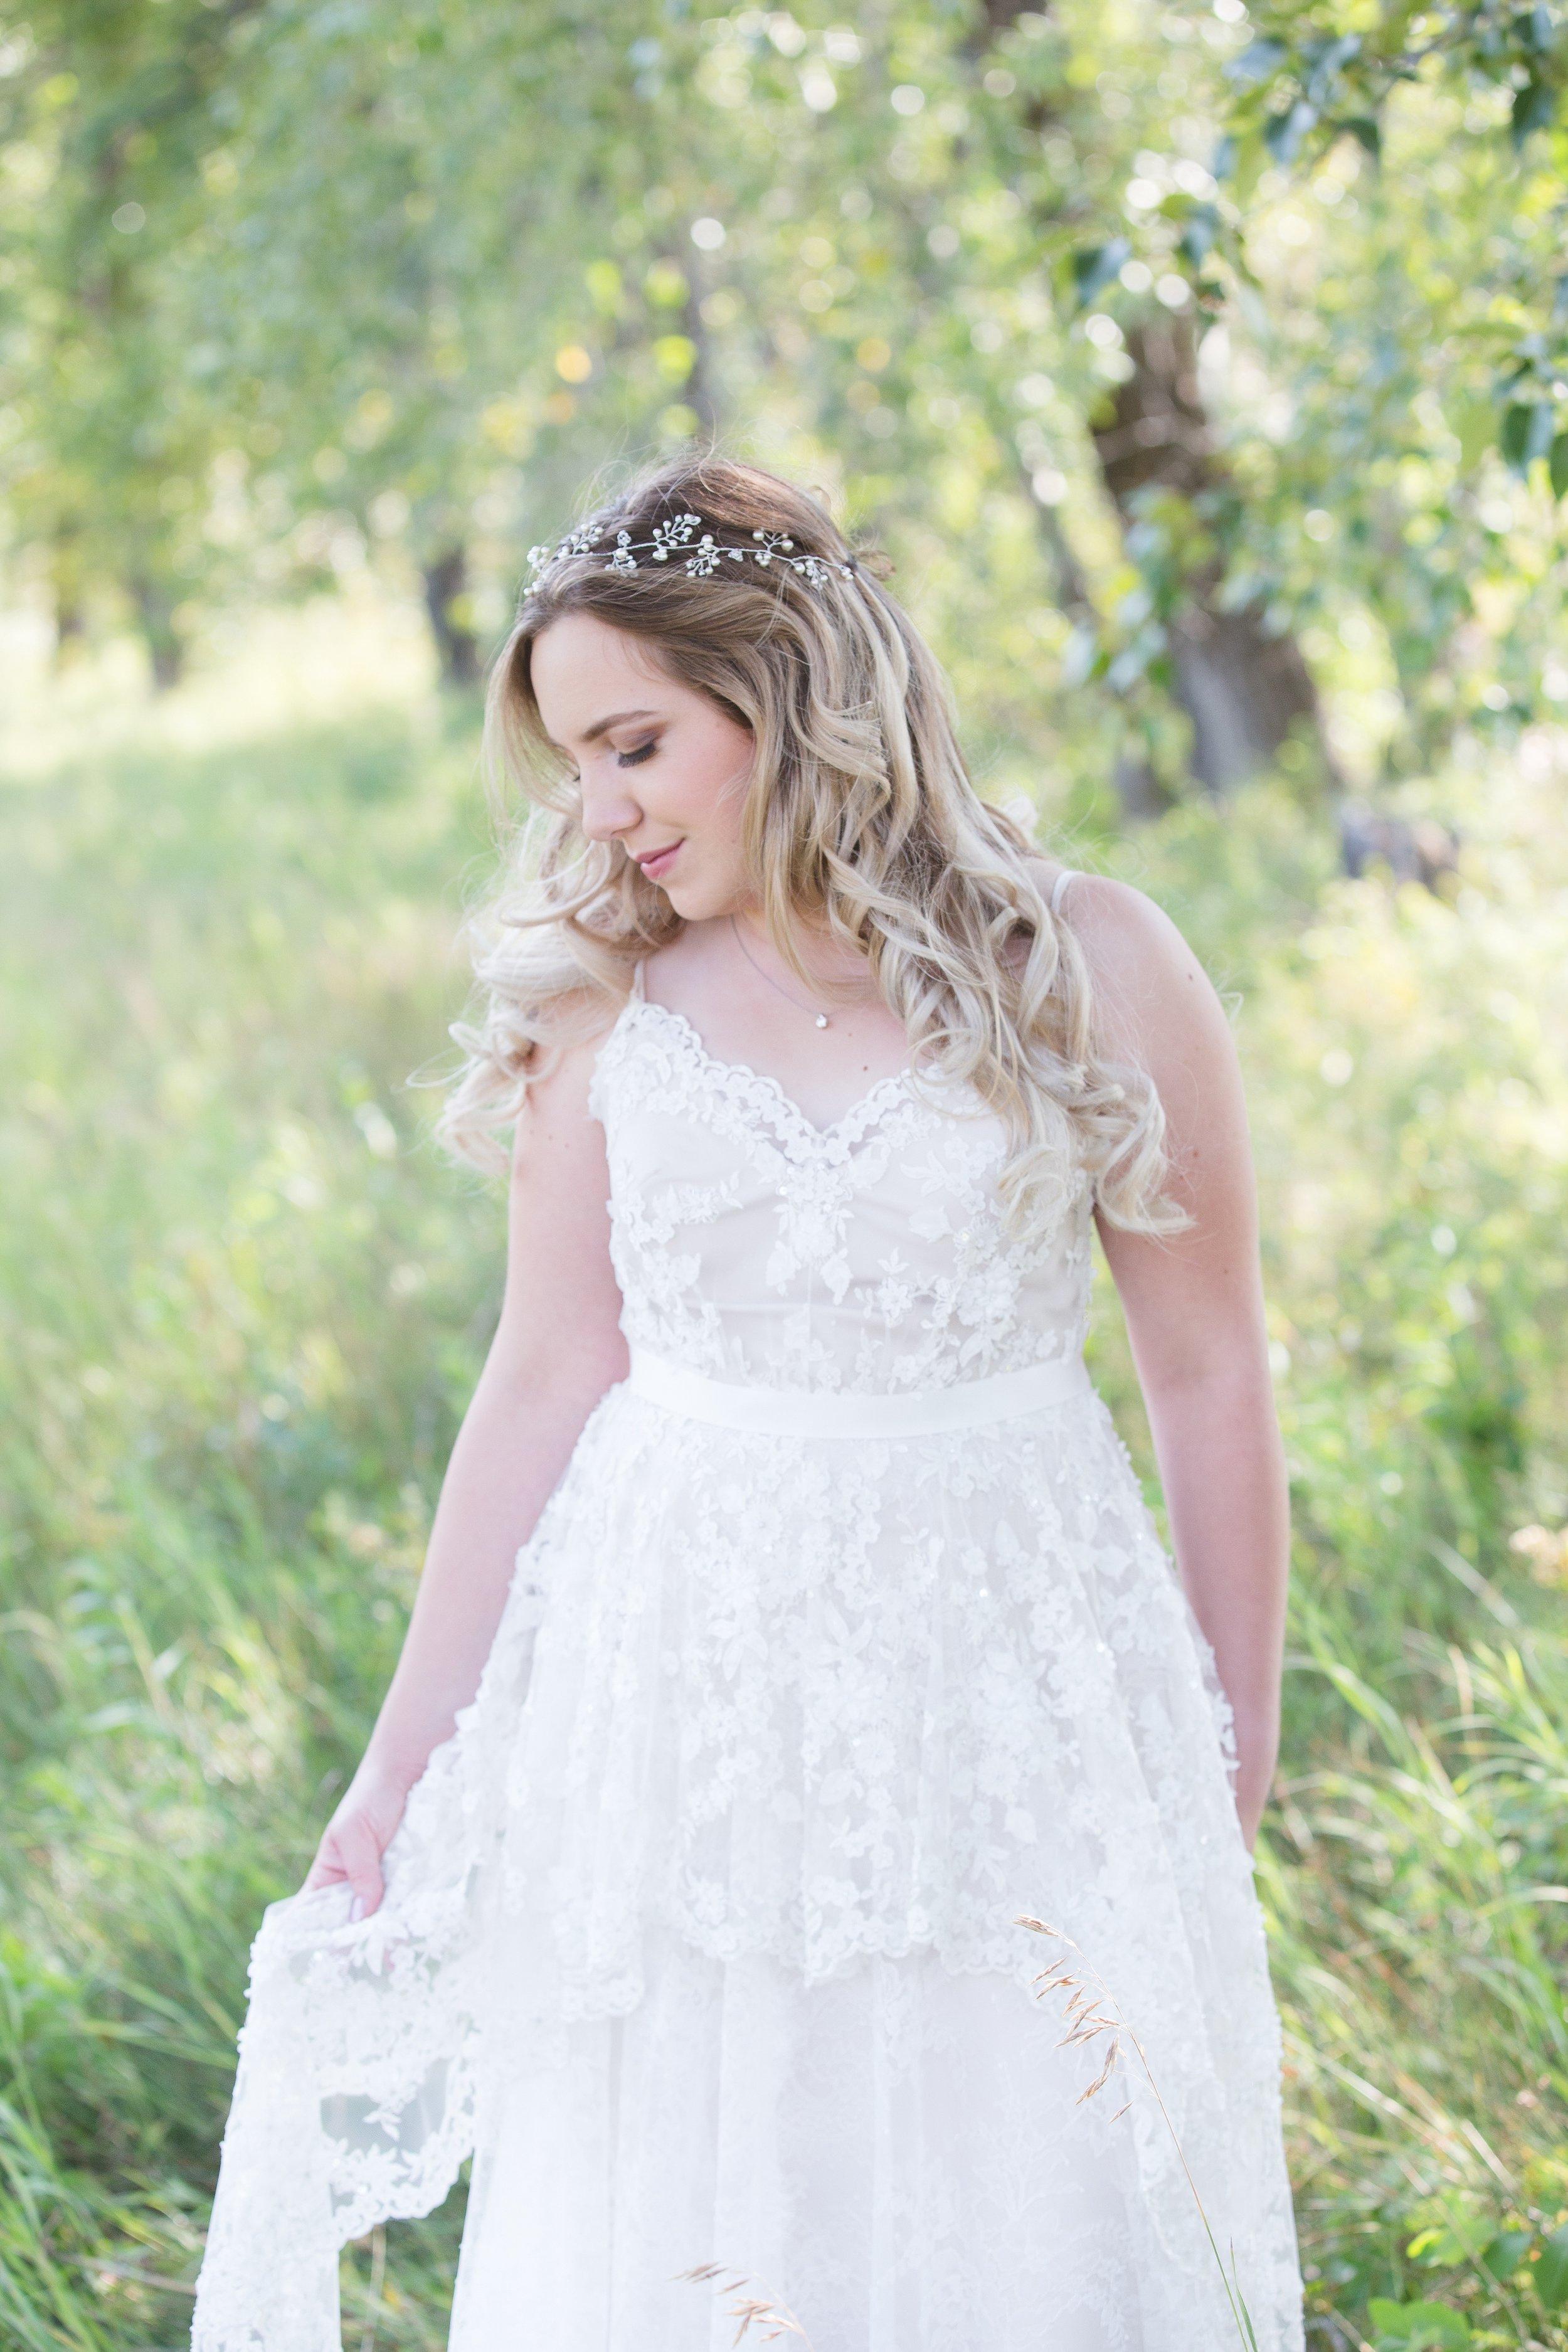 Fish Creek Park Wedding Photography in Calgary